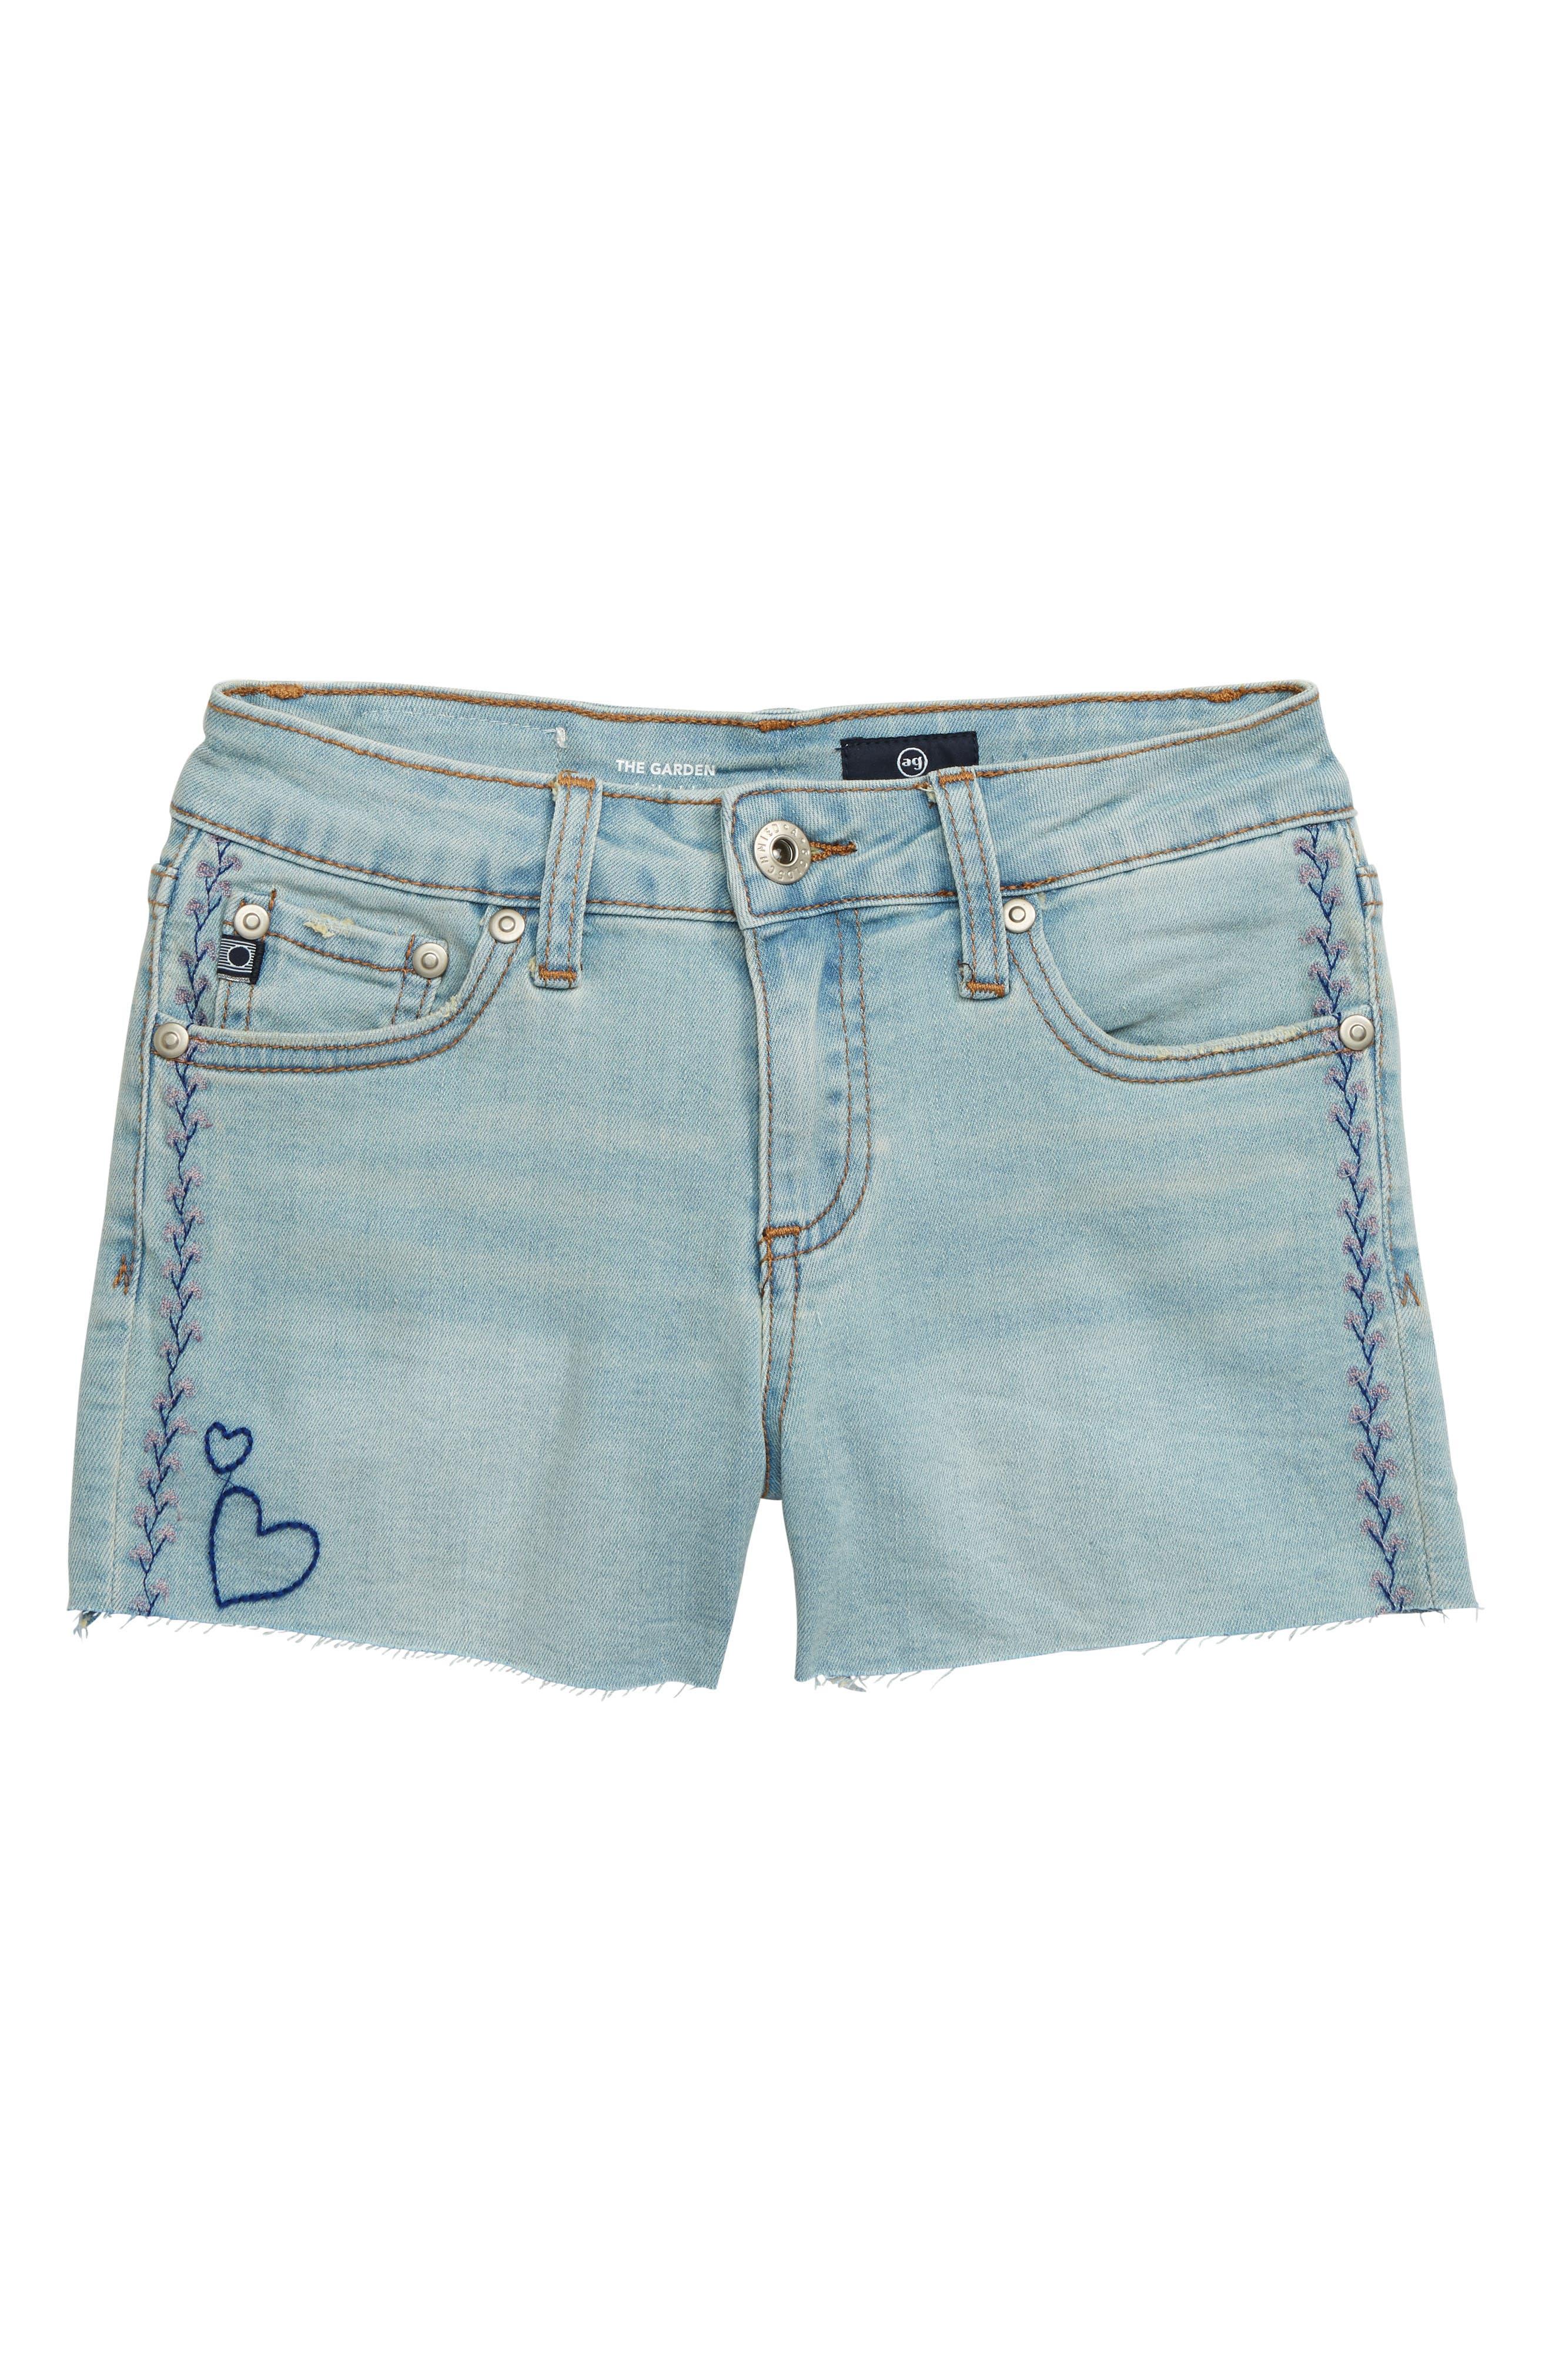 Girls Ag Embroidered Garden Denim Shorts Size 12  Blue